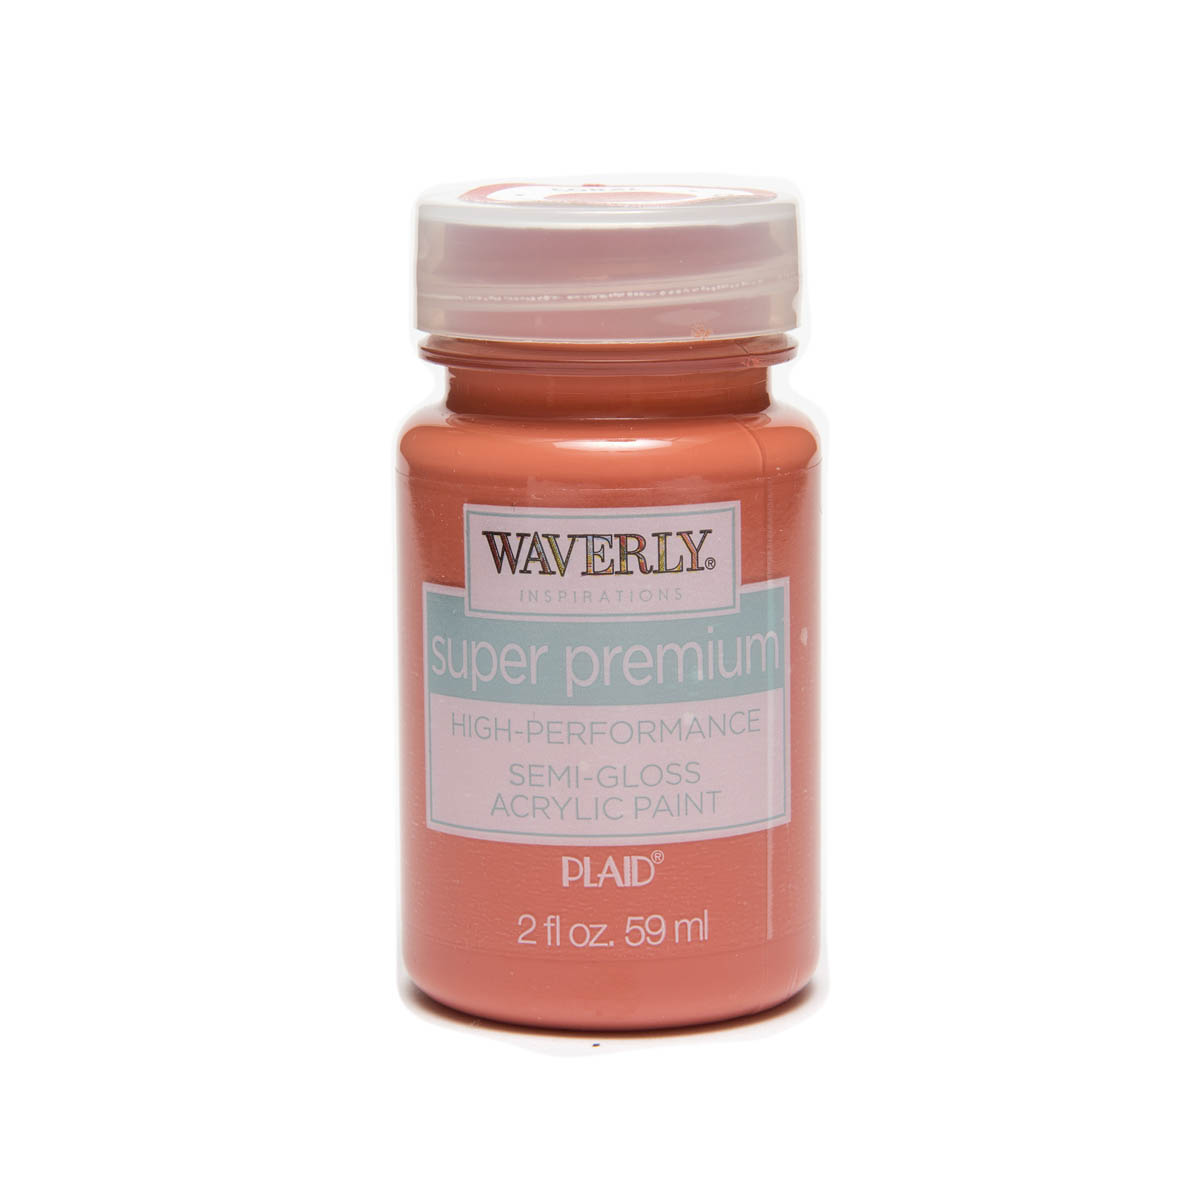 Waverly ® Inspirations Super Premium Semi-Gloss Acrylic Paint - Coral, 2 oz. - 60612E